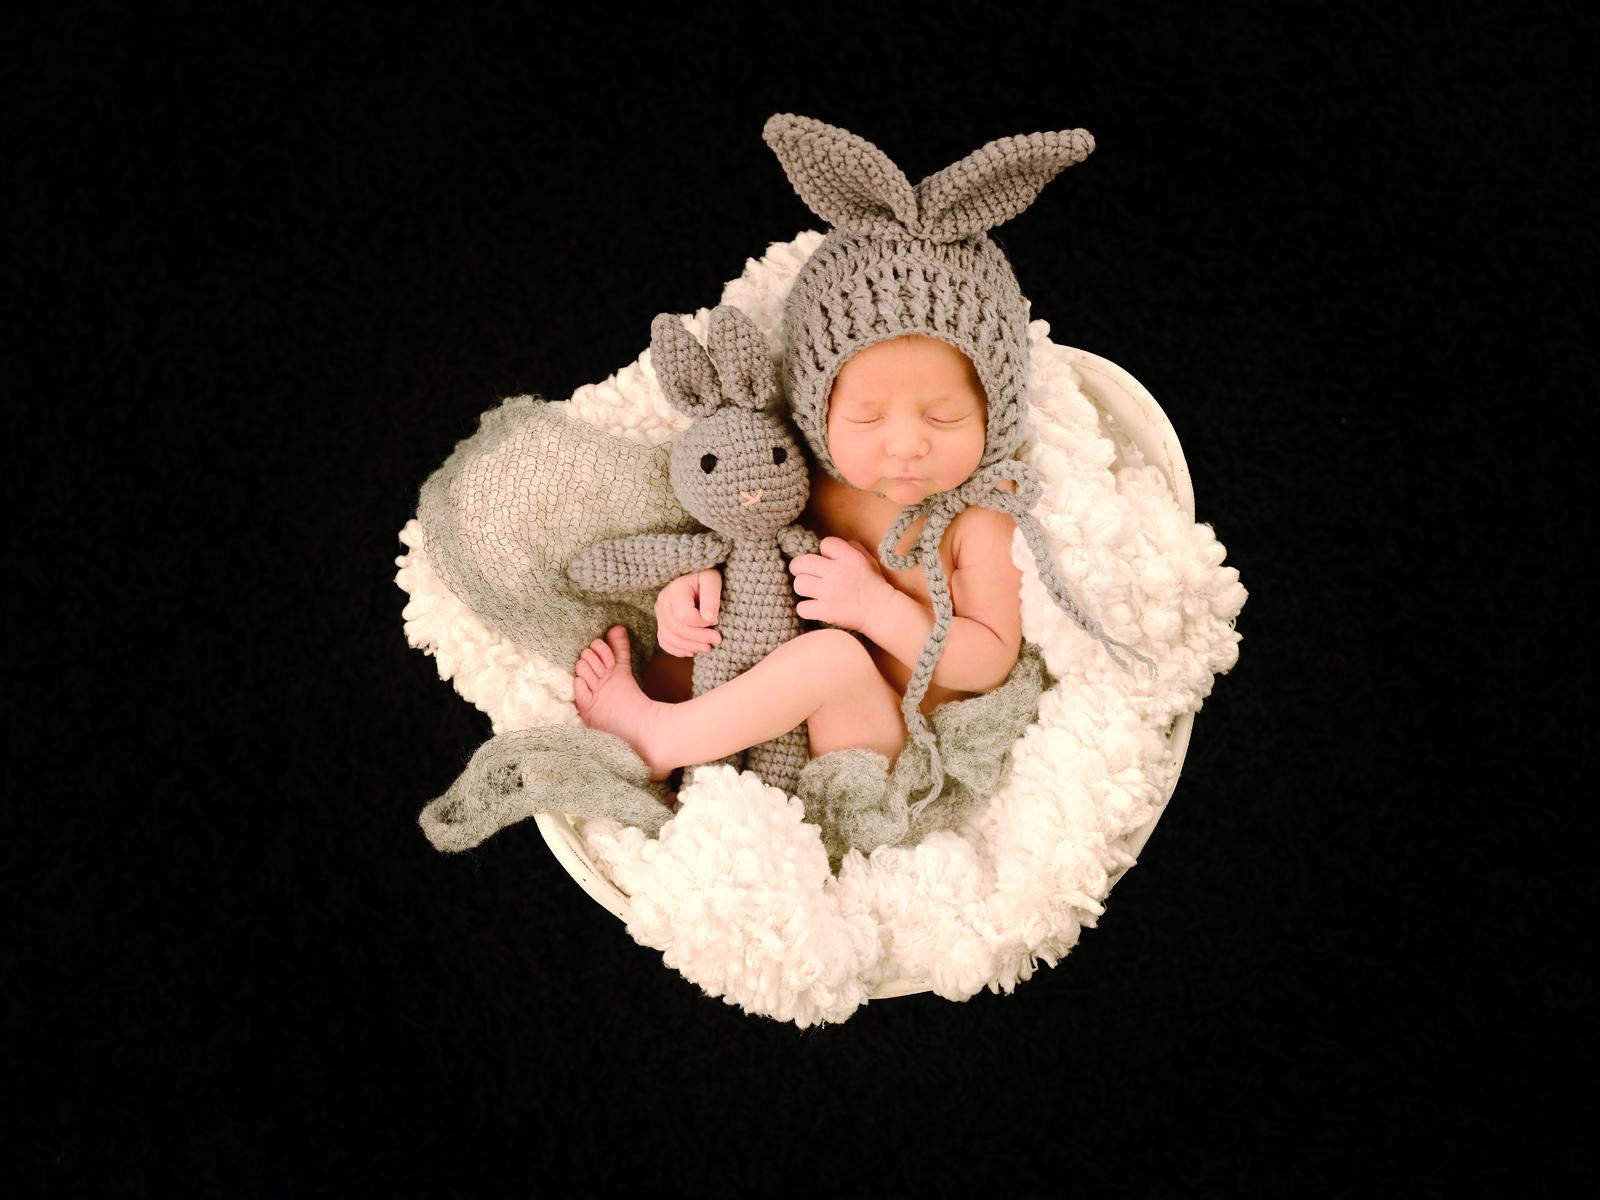 newborn-photography-art0006.jpg